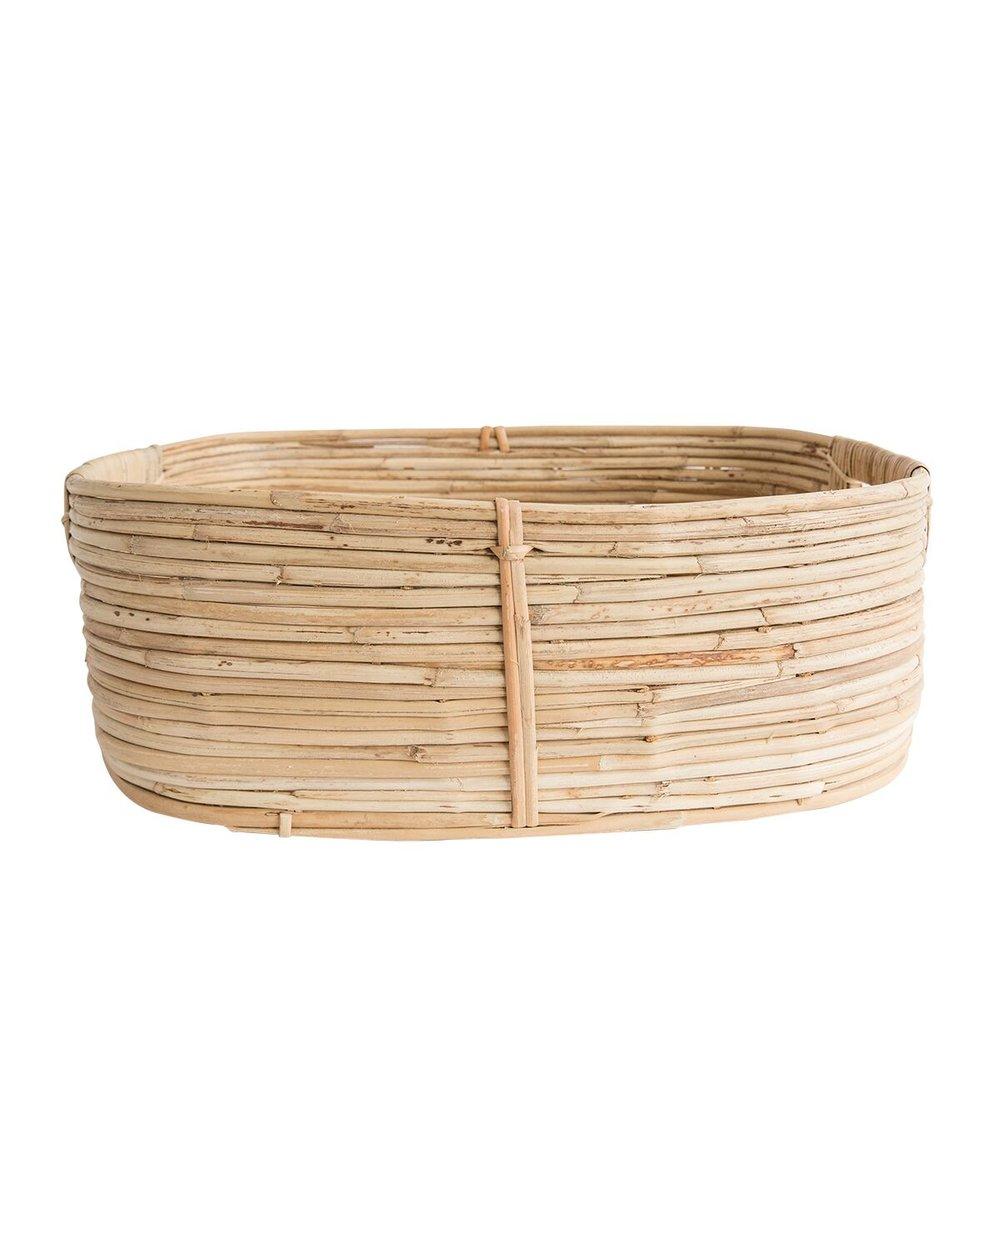 Cane Rattan Baskets 3_preview.jpg